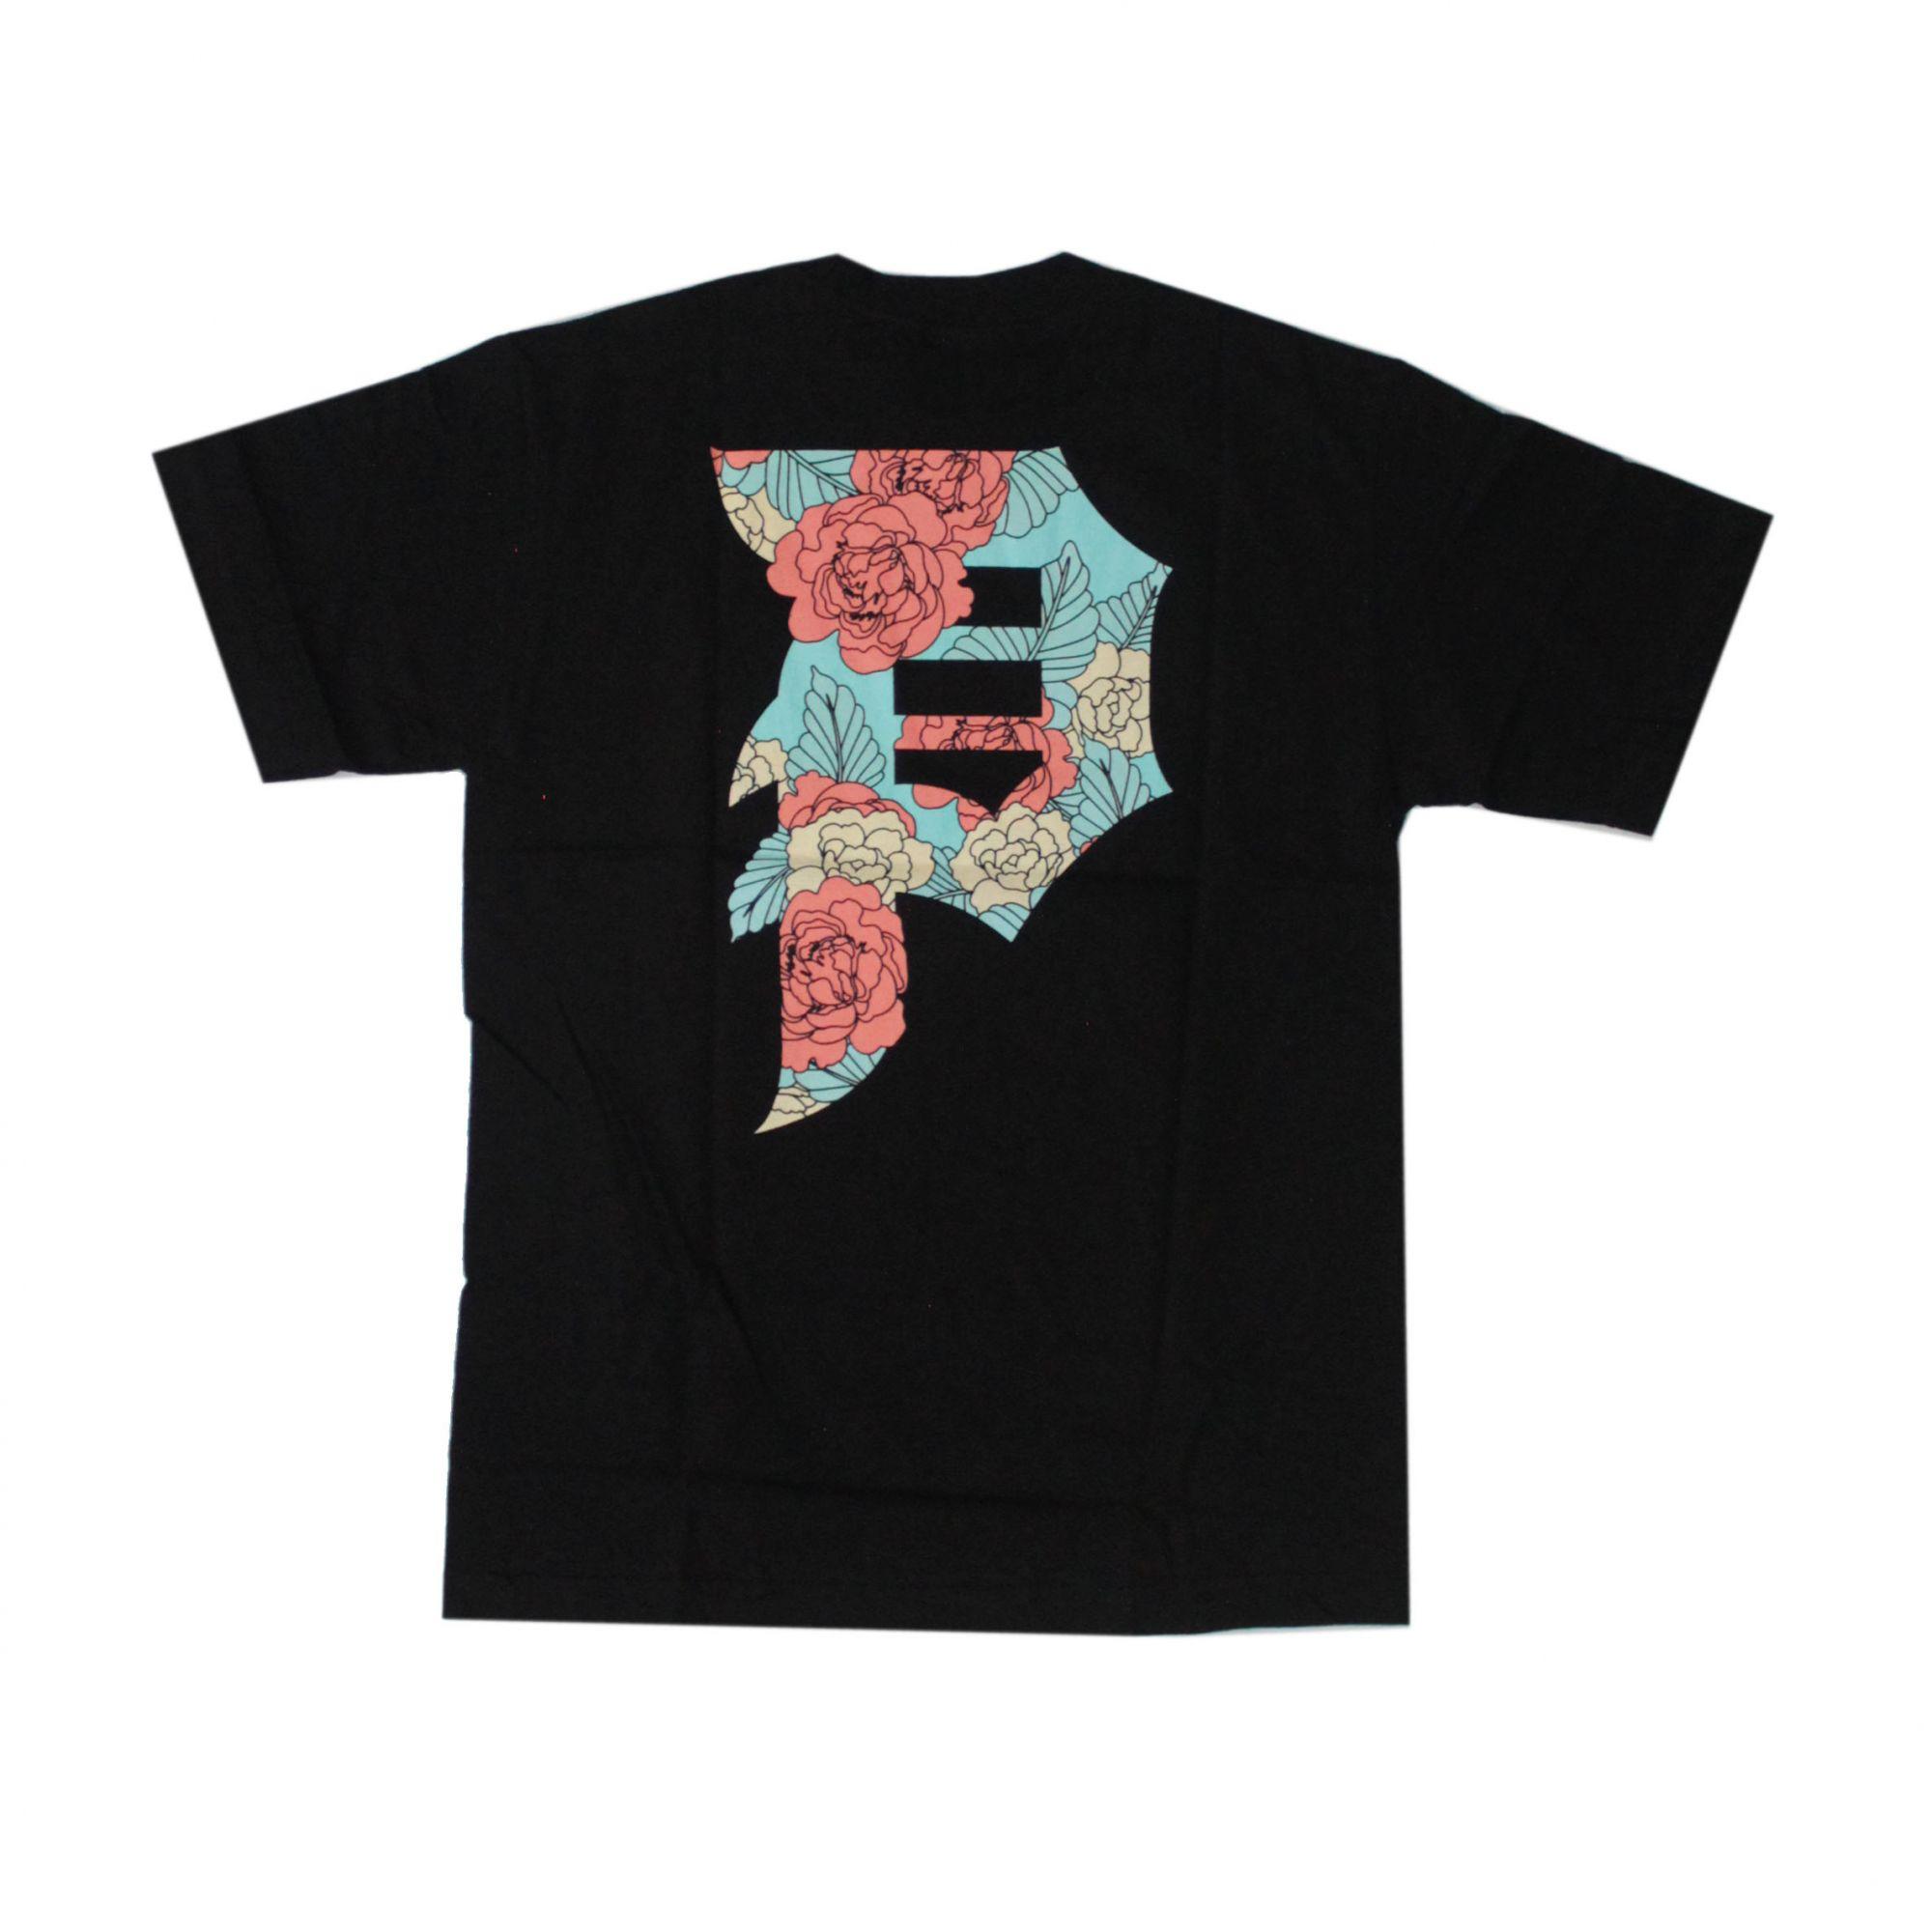 Camiseta Primitive Dirty P Casual Tee Preto